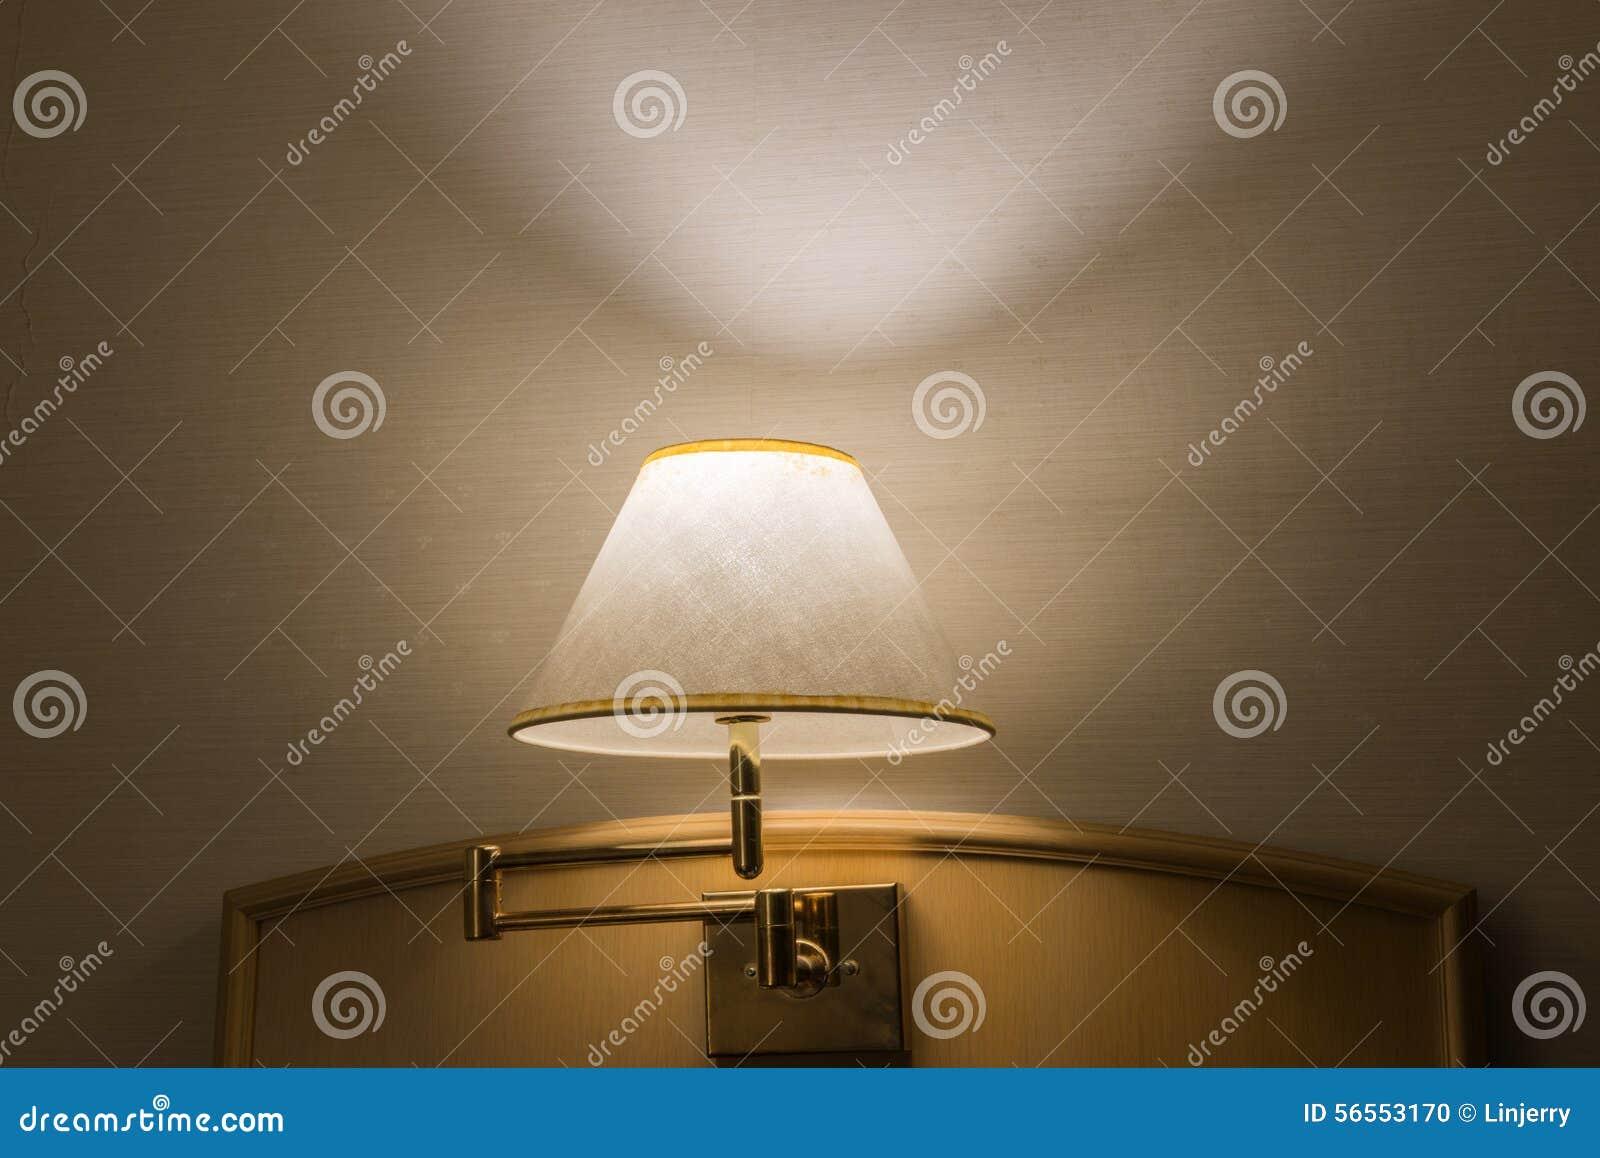 Download Λαμπτήρας πολυτέλειας στον πίνακα Στοκ Εικόνες - εικόνα από νύχτα, ηλεκτρικός: 56553170